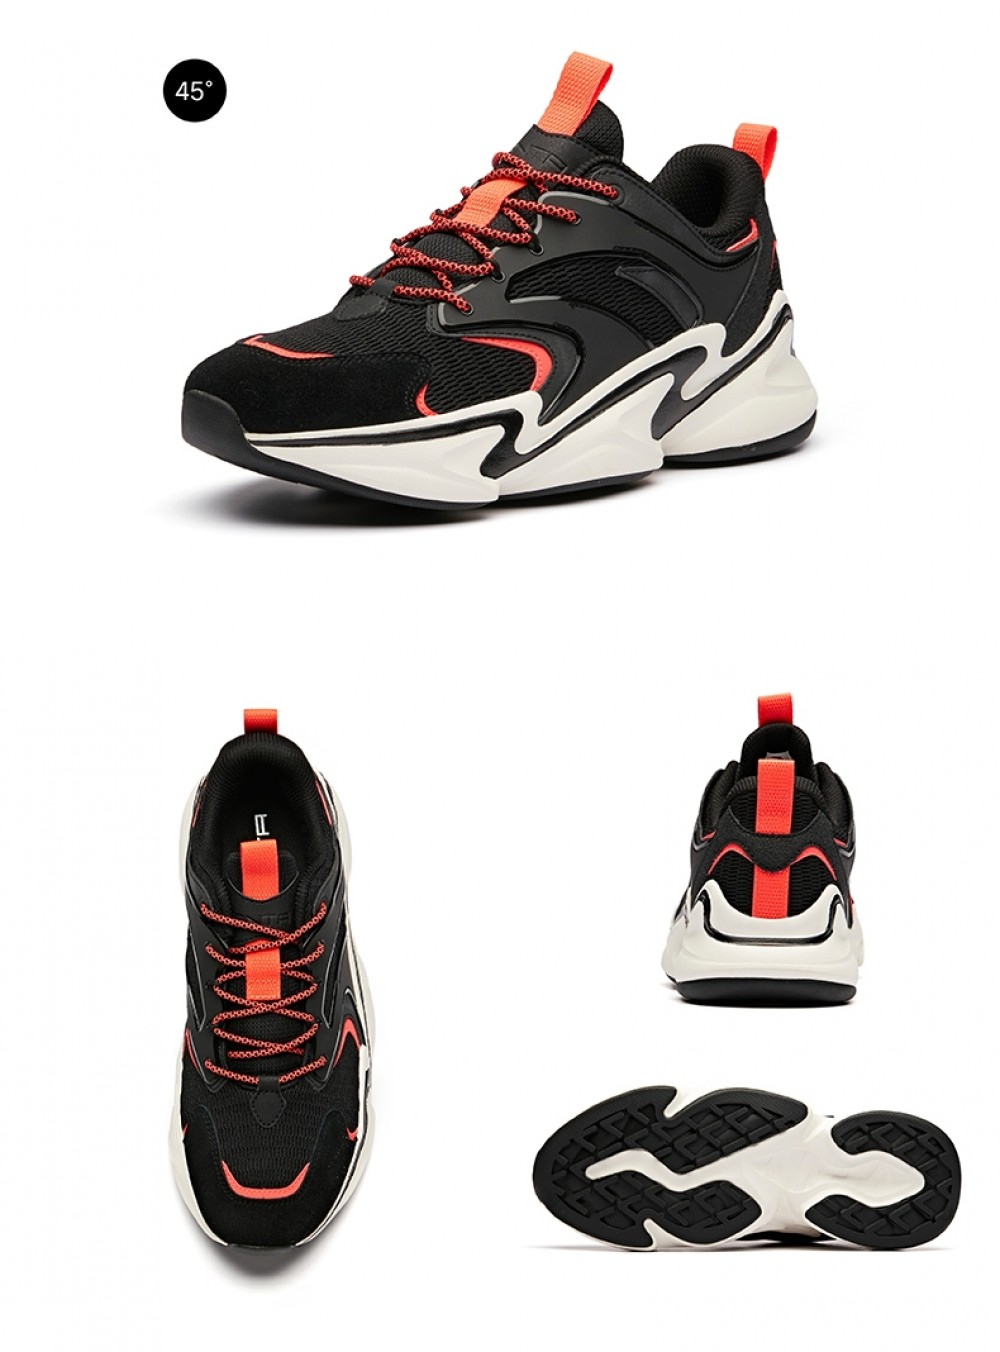 Anta 2019 Spring New Men's Stylish Retro Running Sneakers